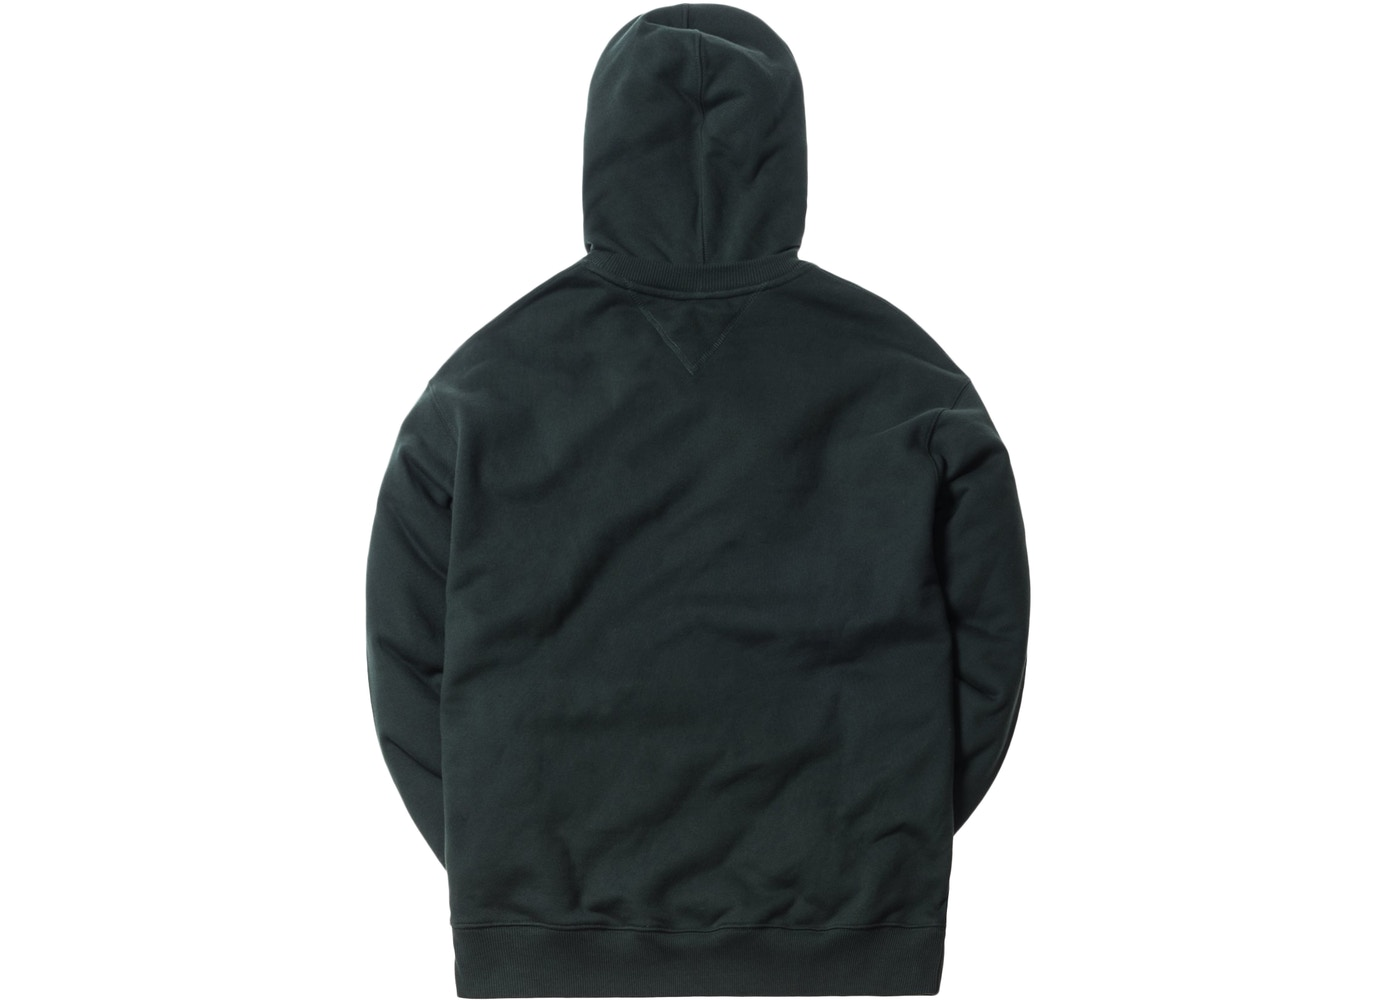 b6389d09c2 Streetwear - Kith Tops Sweatshirts - Total Sold